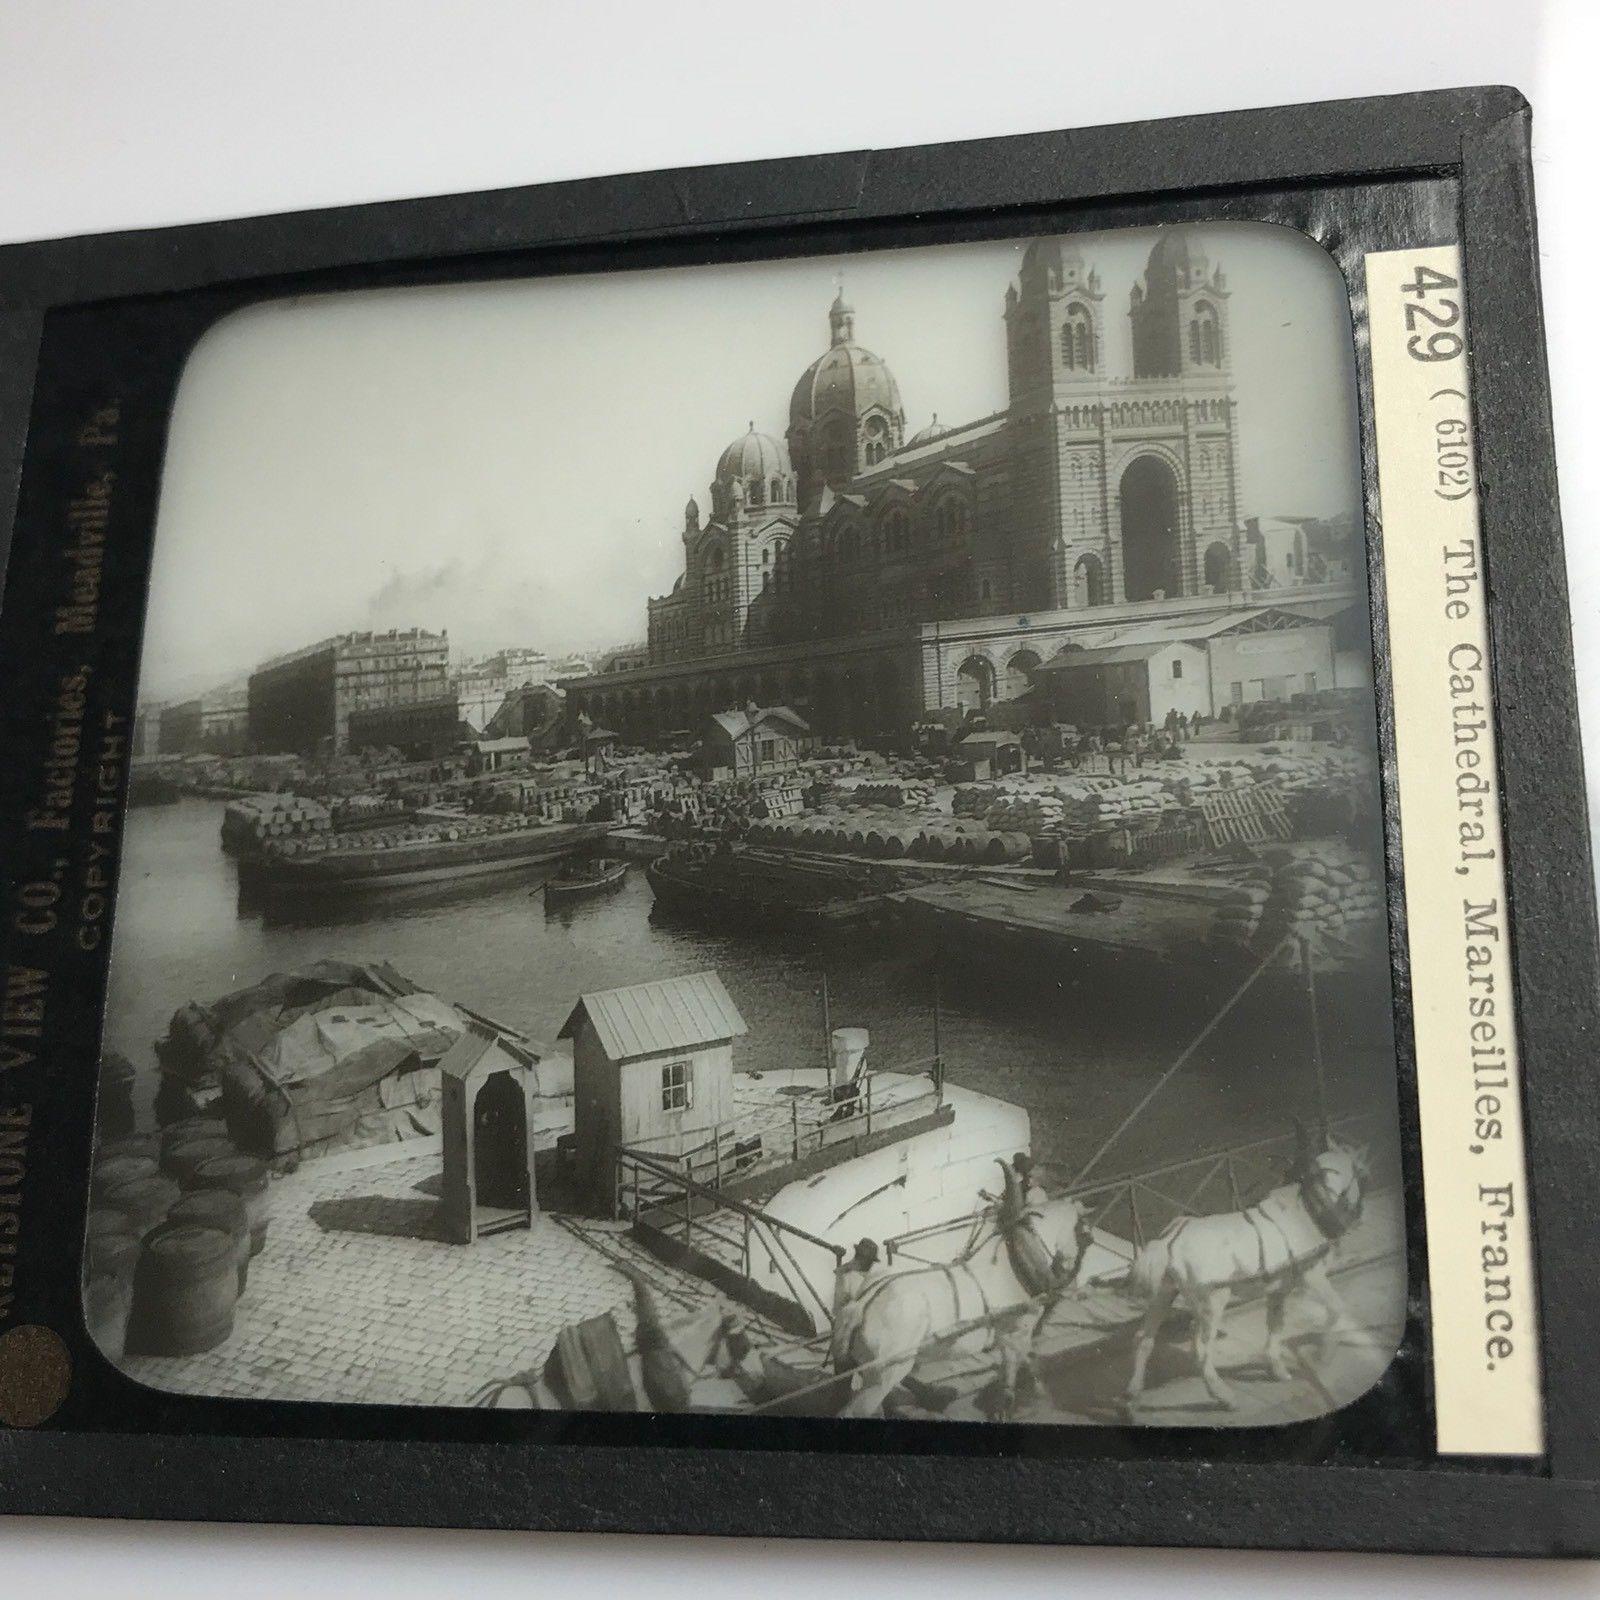 Vtg Keystone Magic Lantern Slide Photo Marseilles France Harbor Boats Cathedral